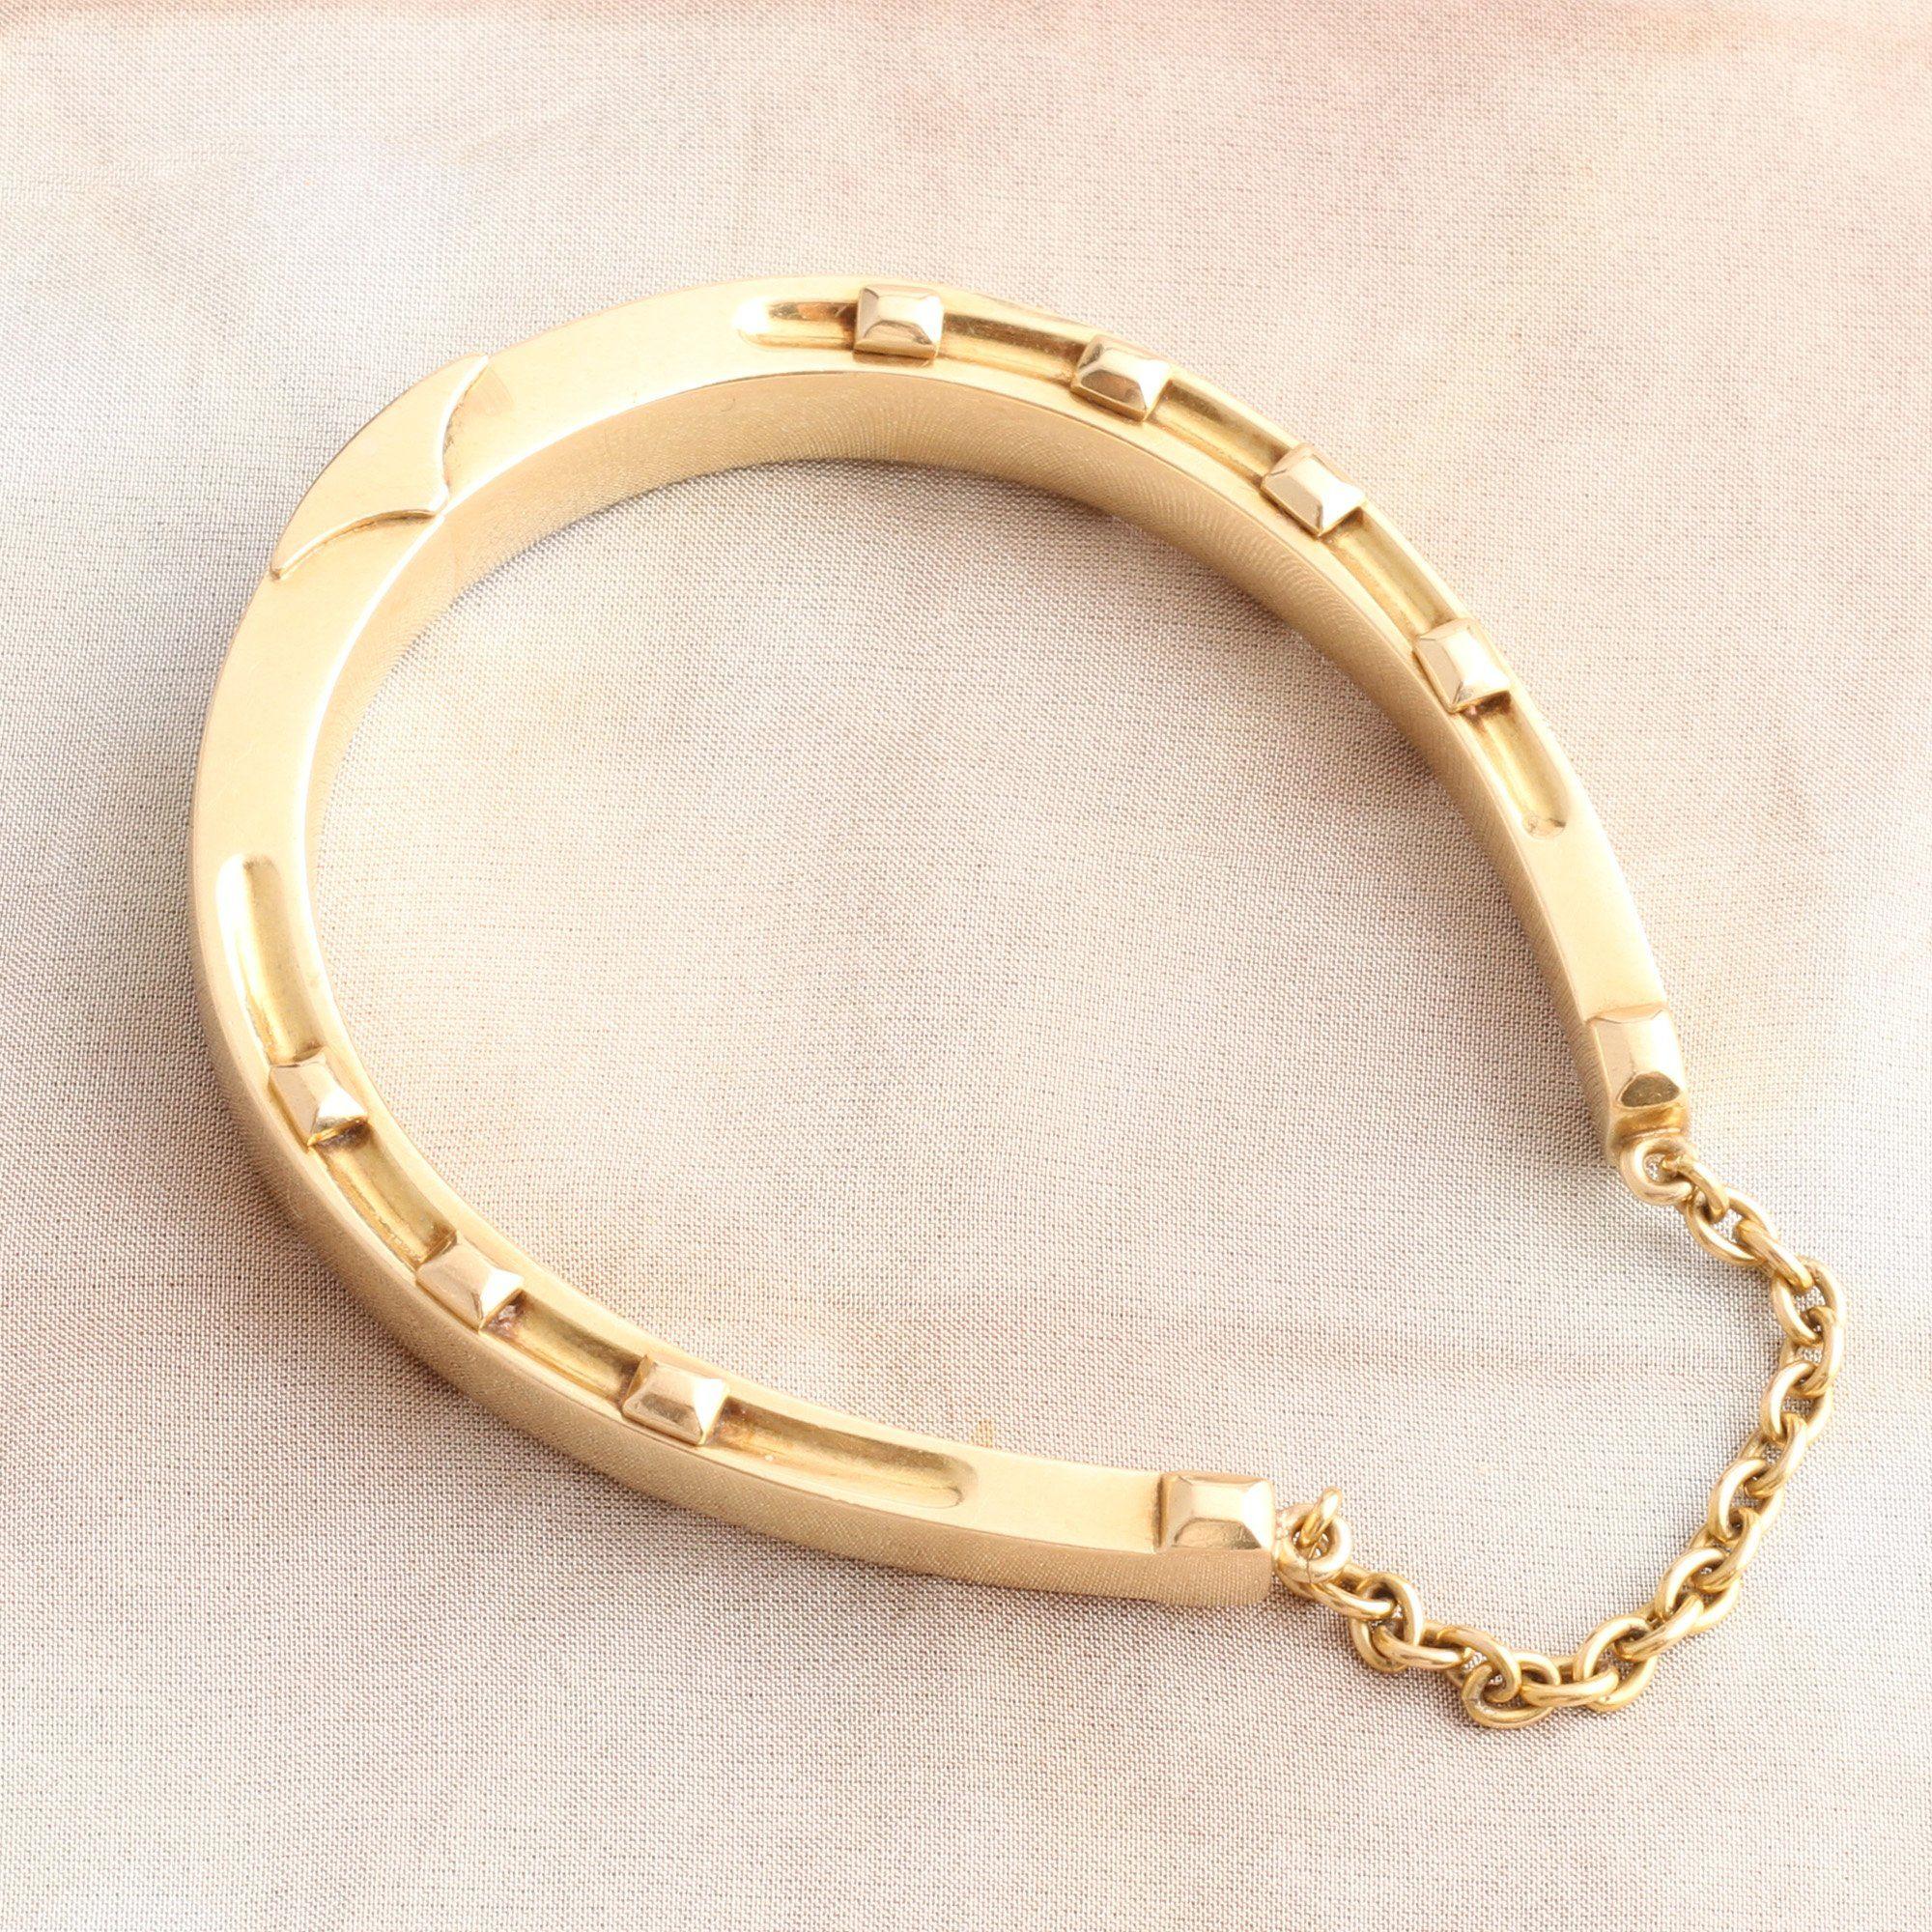 Victorian Gold Horseshoe Bangle